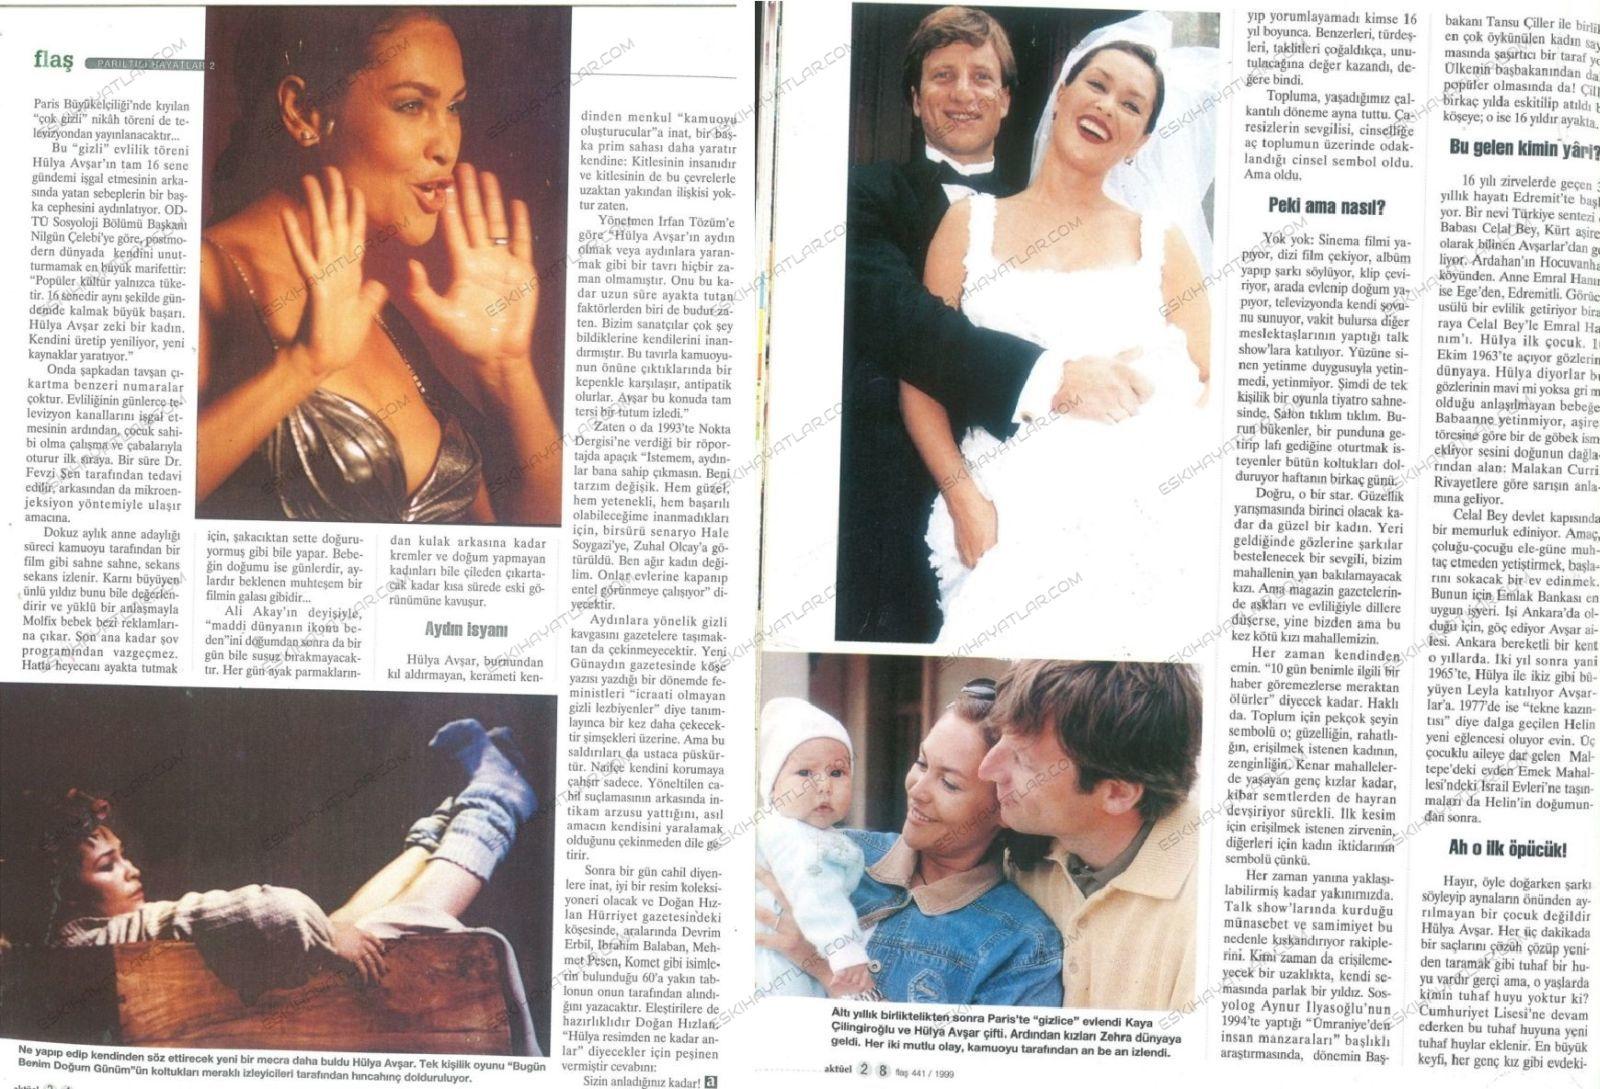 hulya-avsar-gencligi-kaya-cilingiroglu-ile-evliligi-zehra-bebek-fotografi-helin-avsar-leyla-avsar-2000-yilinda-turkiye-aktuel-dergisi-arsivleri (2)